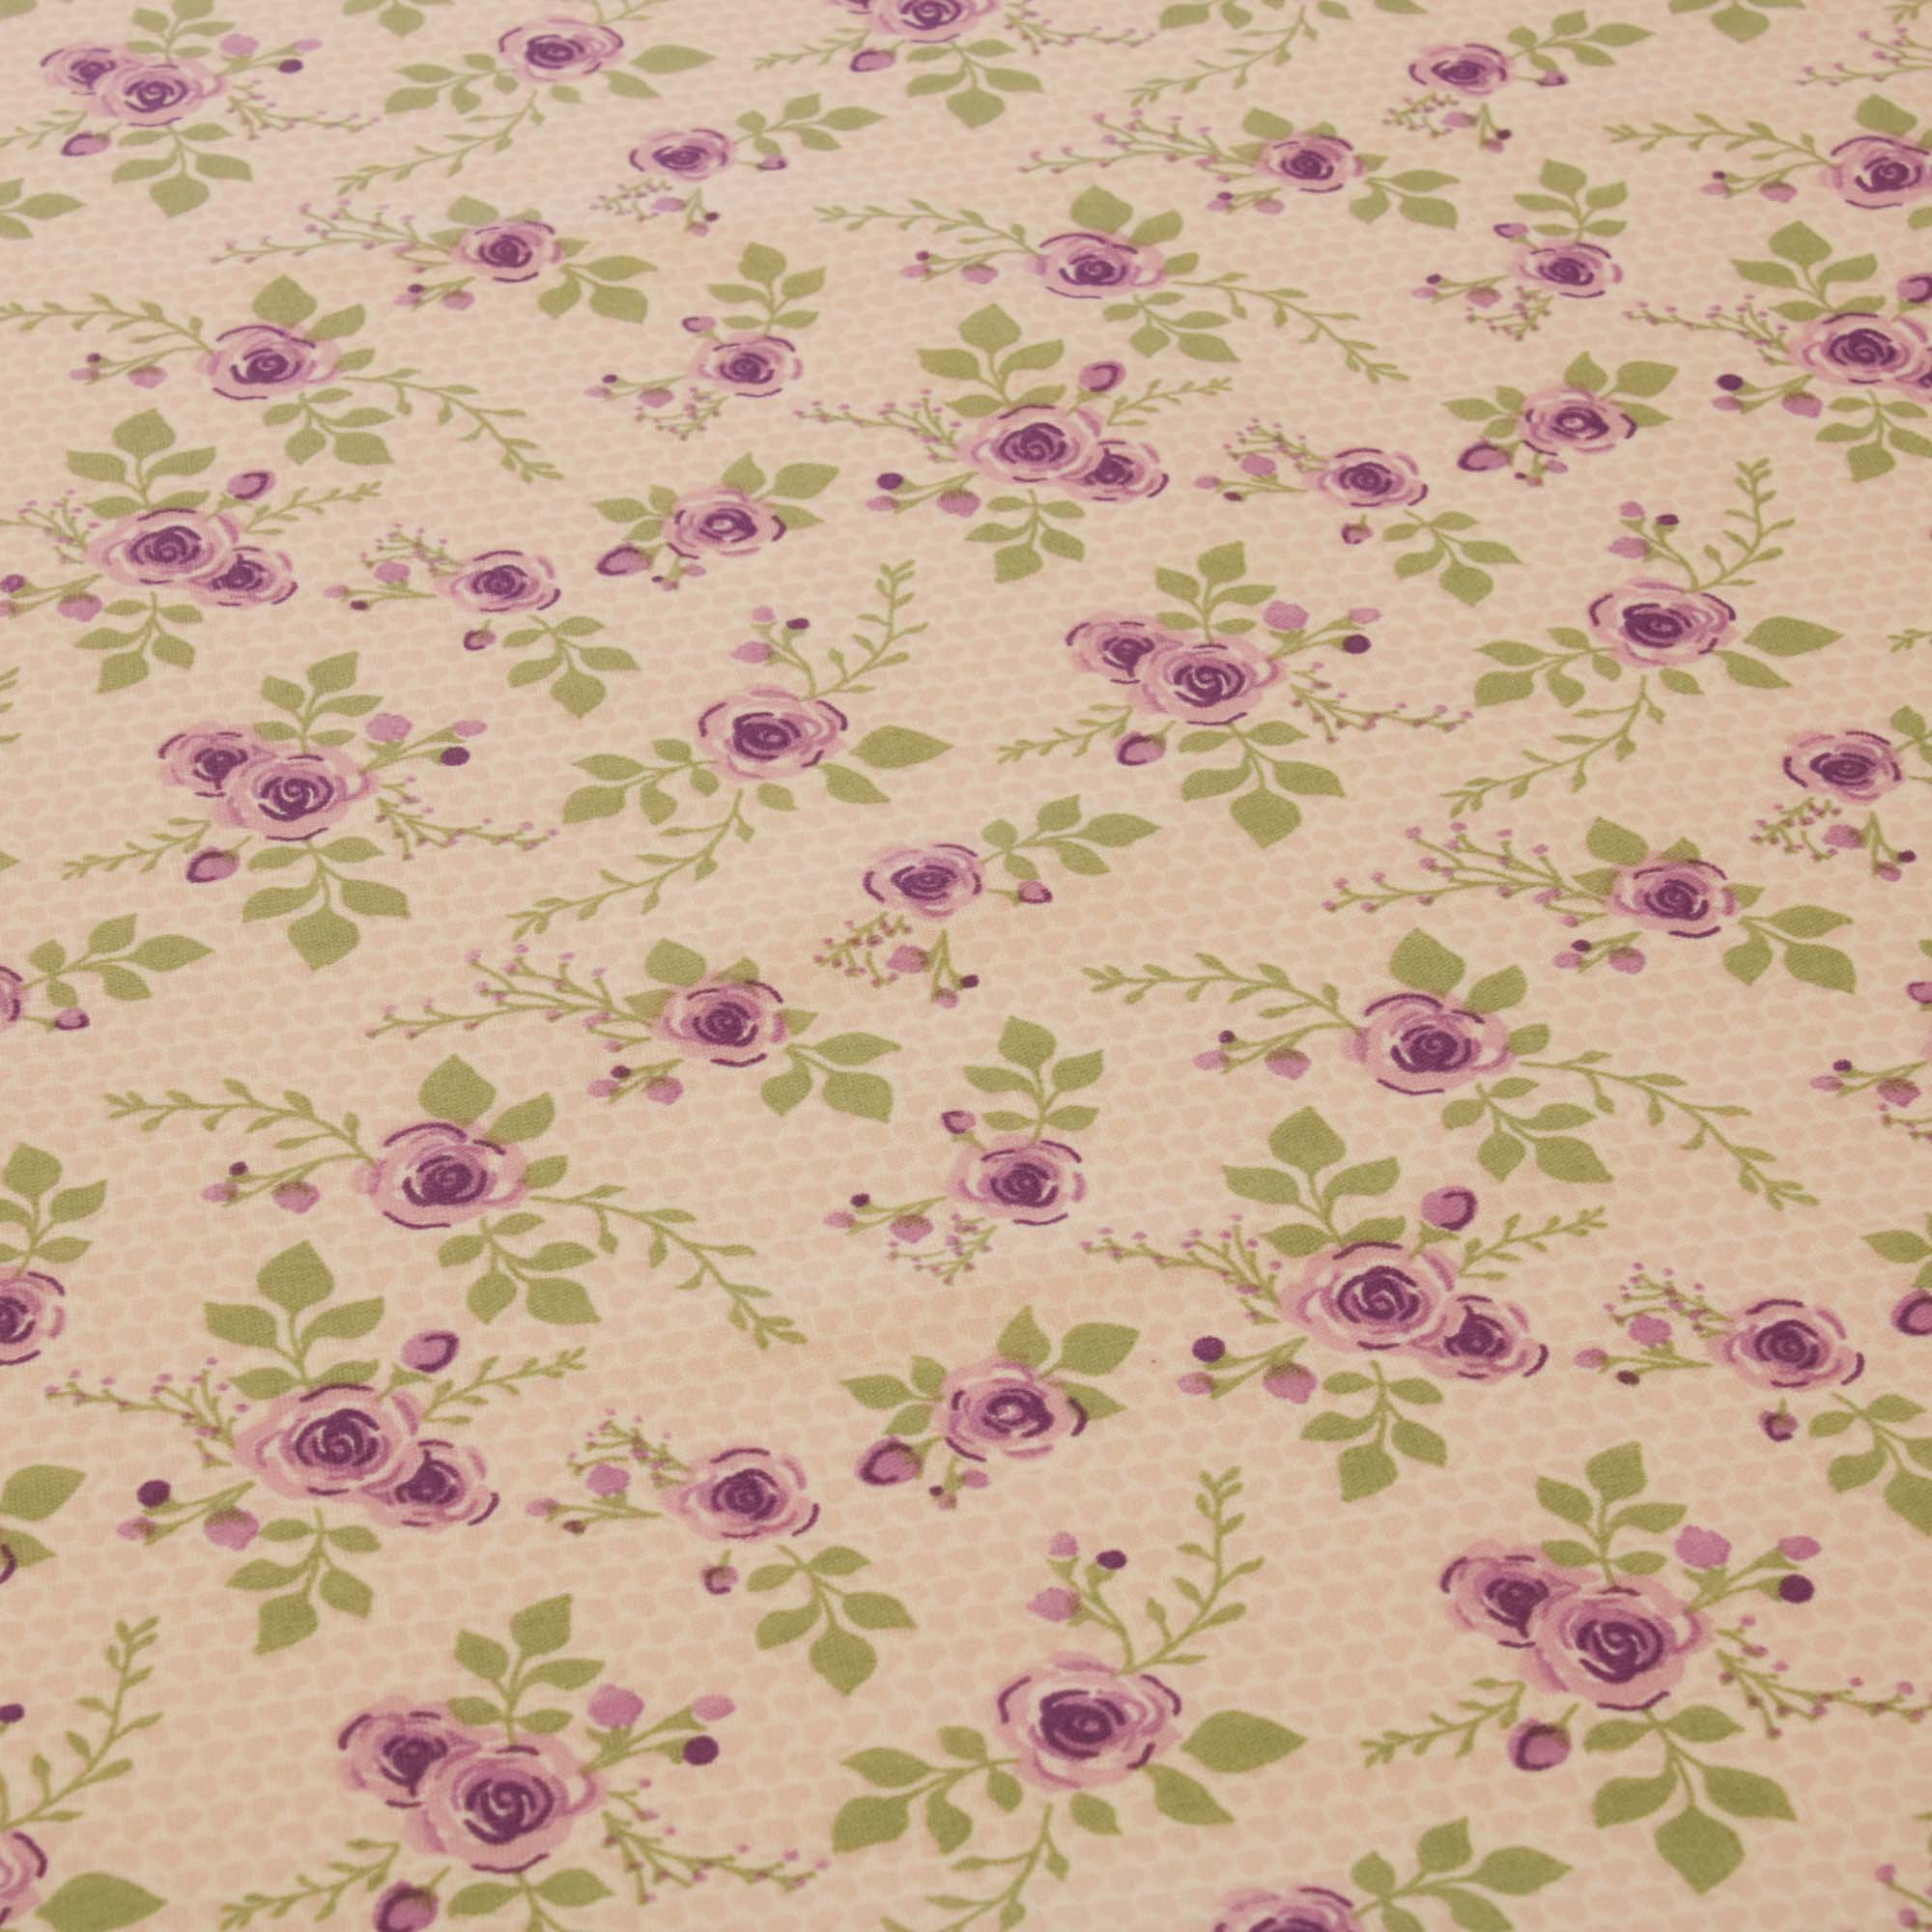 Tecido tricoline estampado flores lilas 1,40 m largura